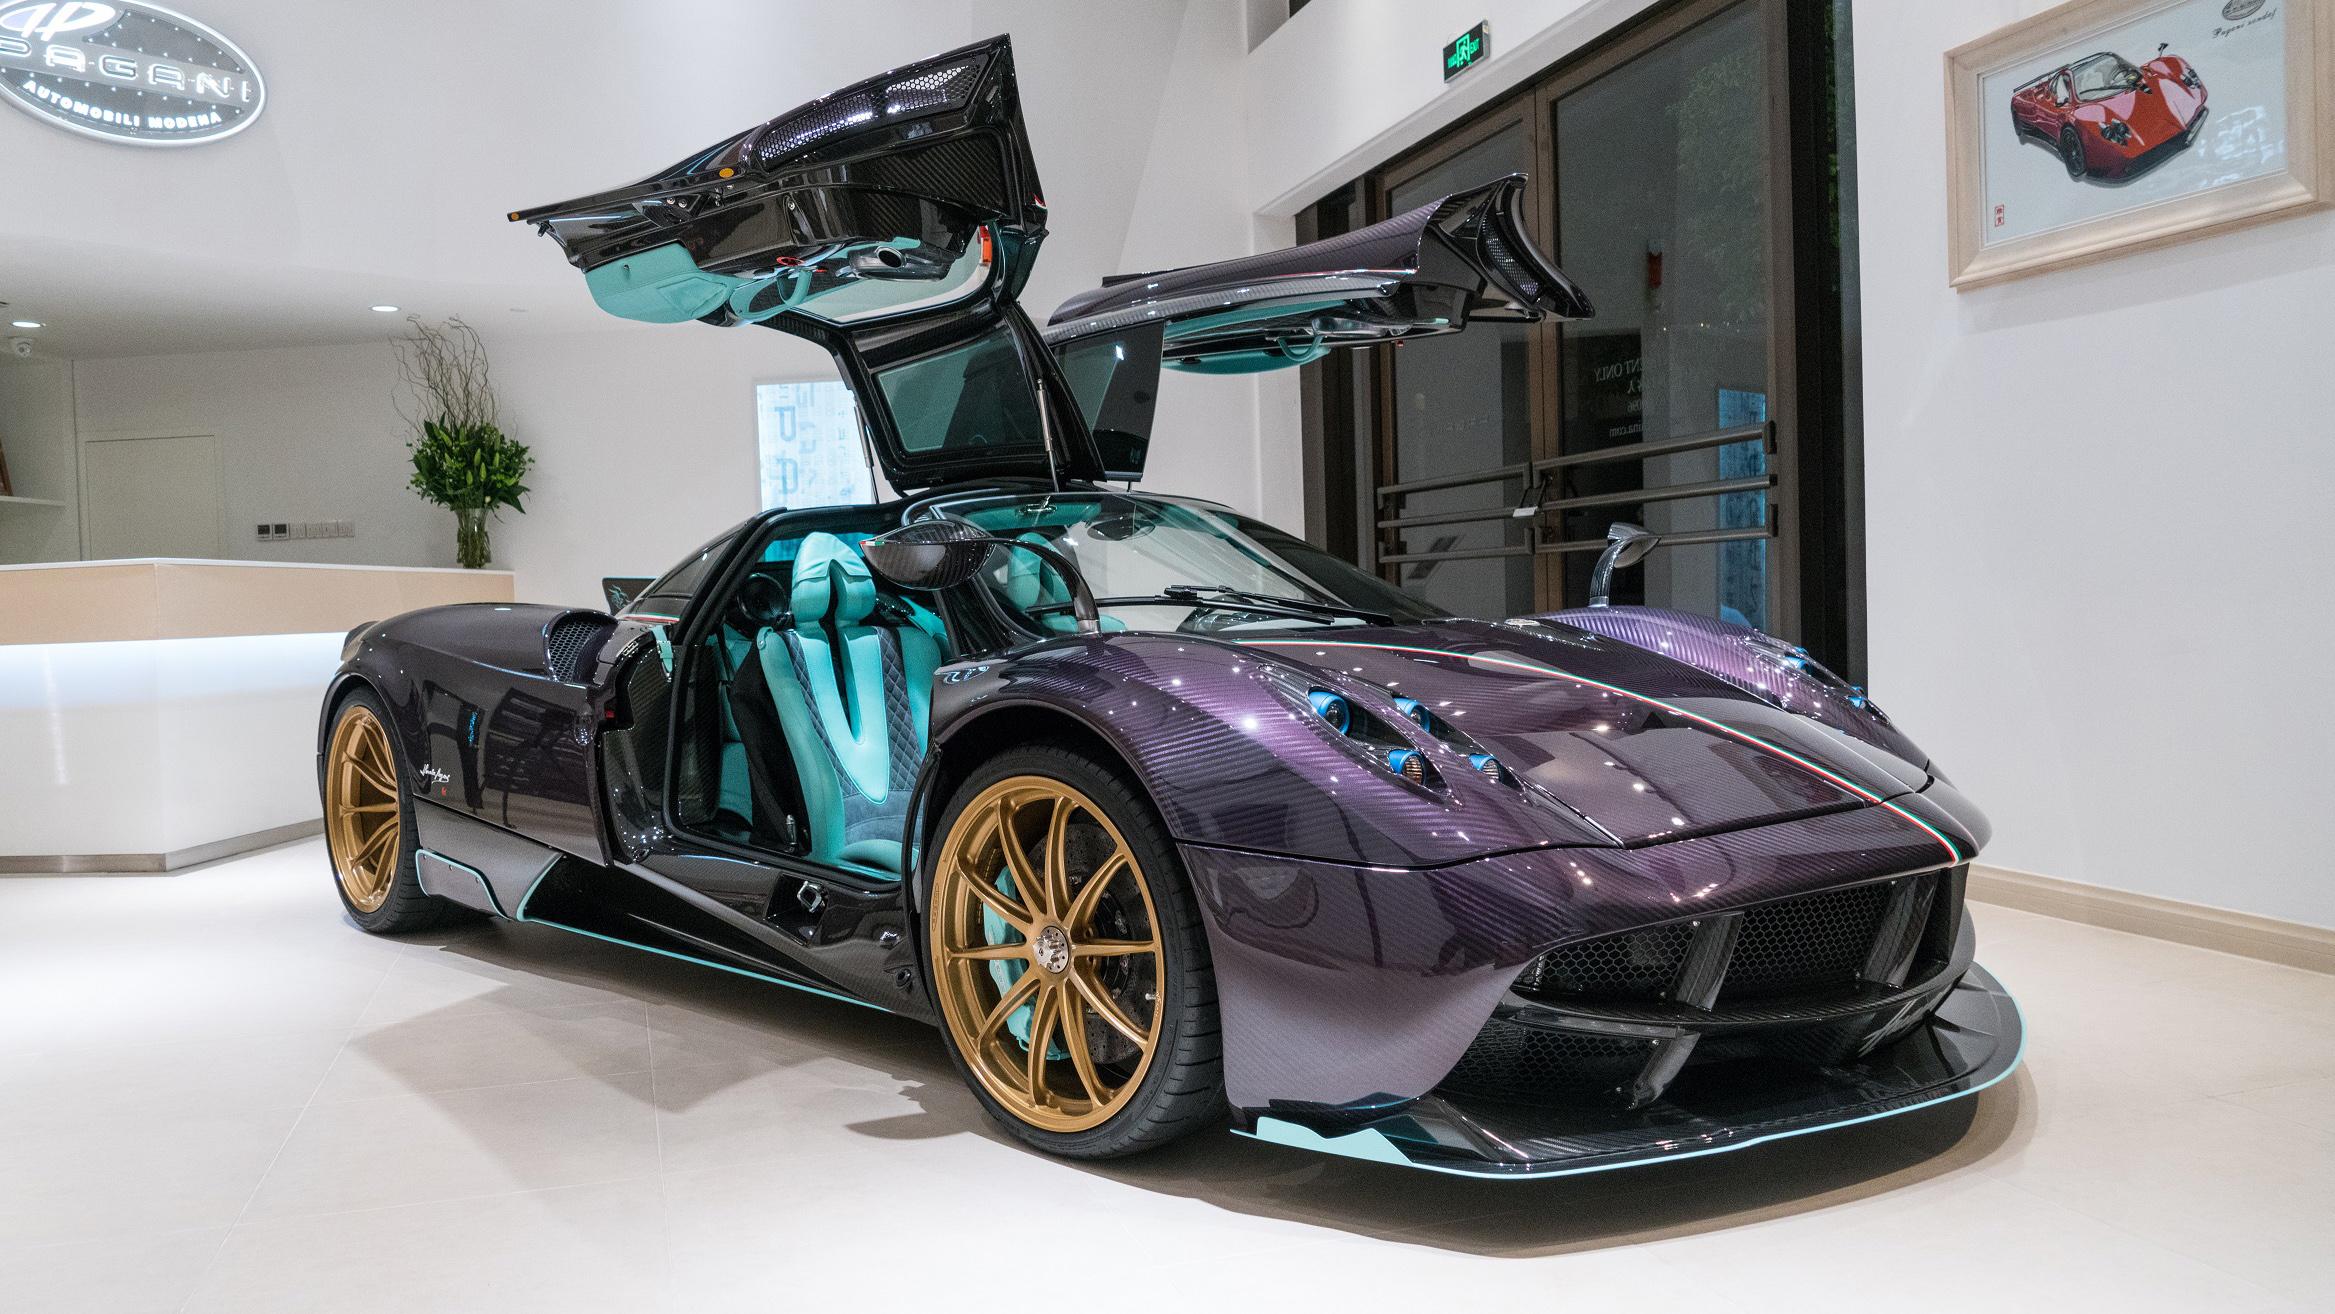 Meet the one-of-three Pagani Huayra Dinastia | Top Gear